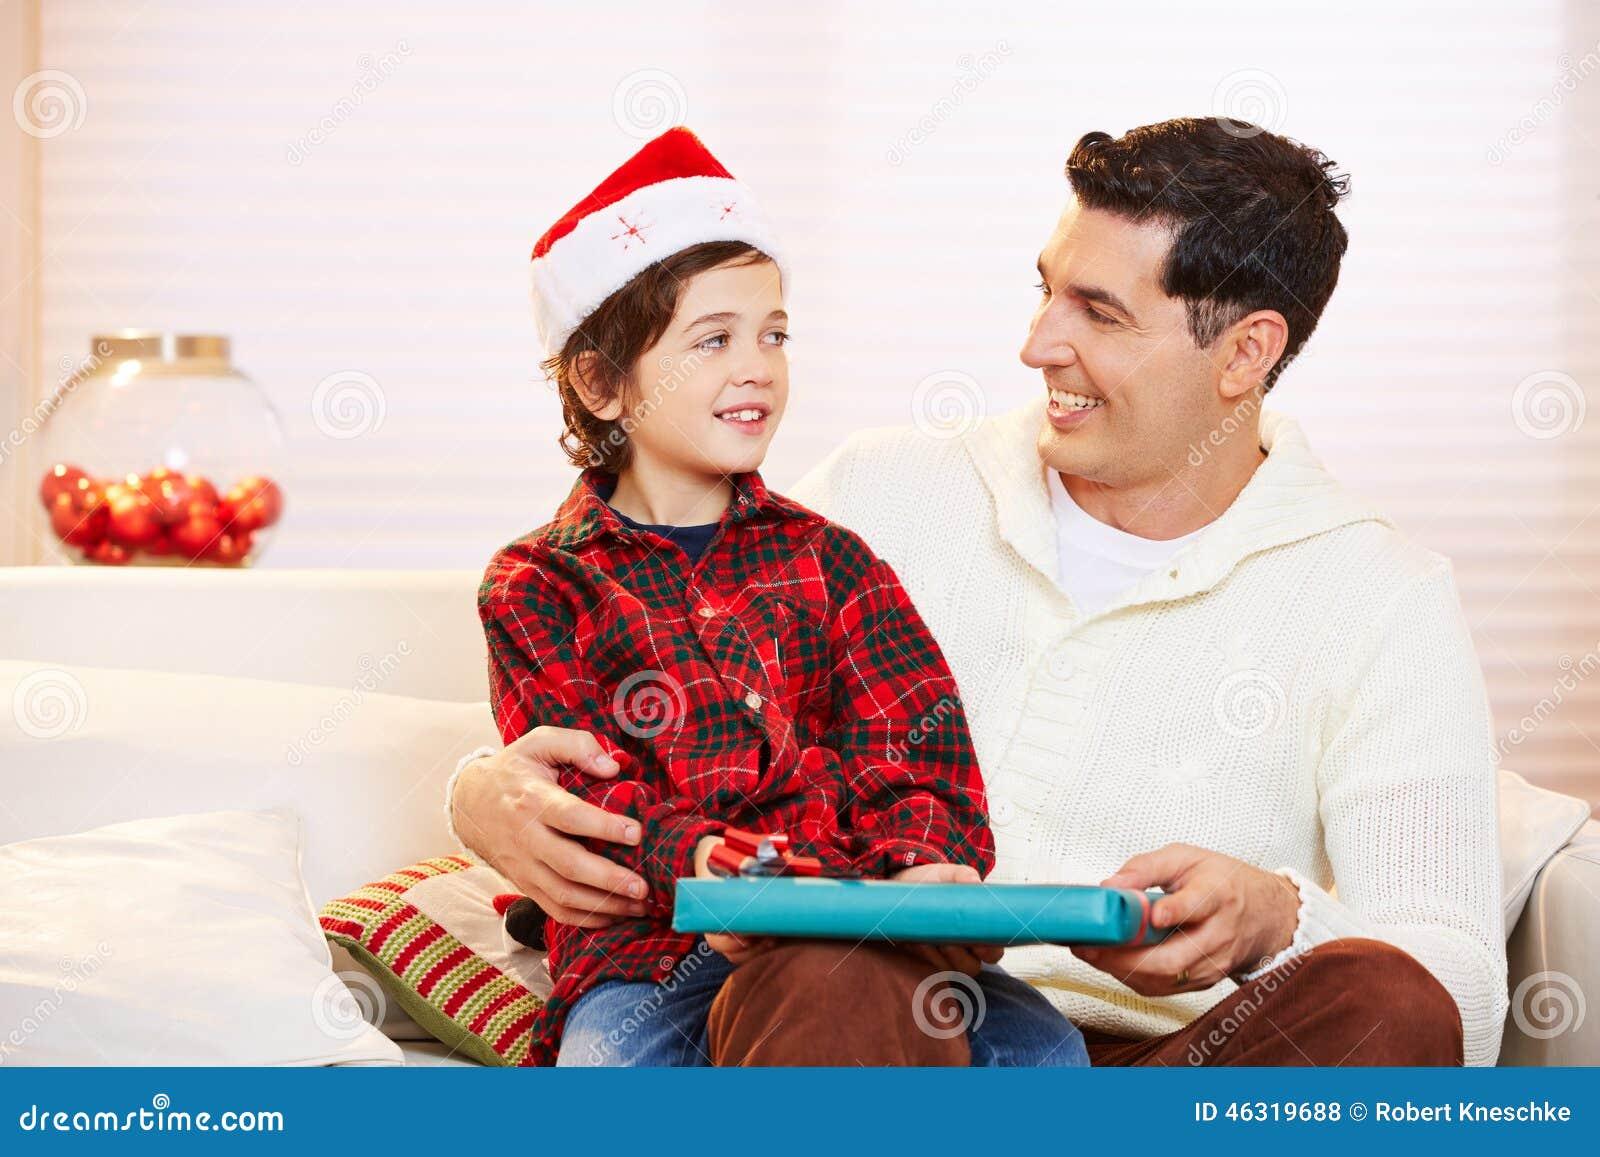 Father giving his son gift at christmas stock photo - Regalo padre navidad ...